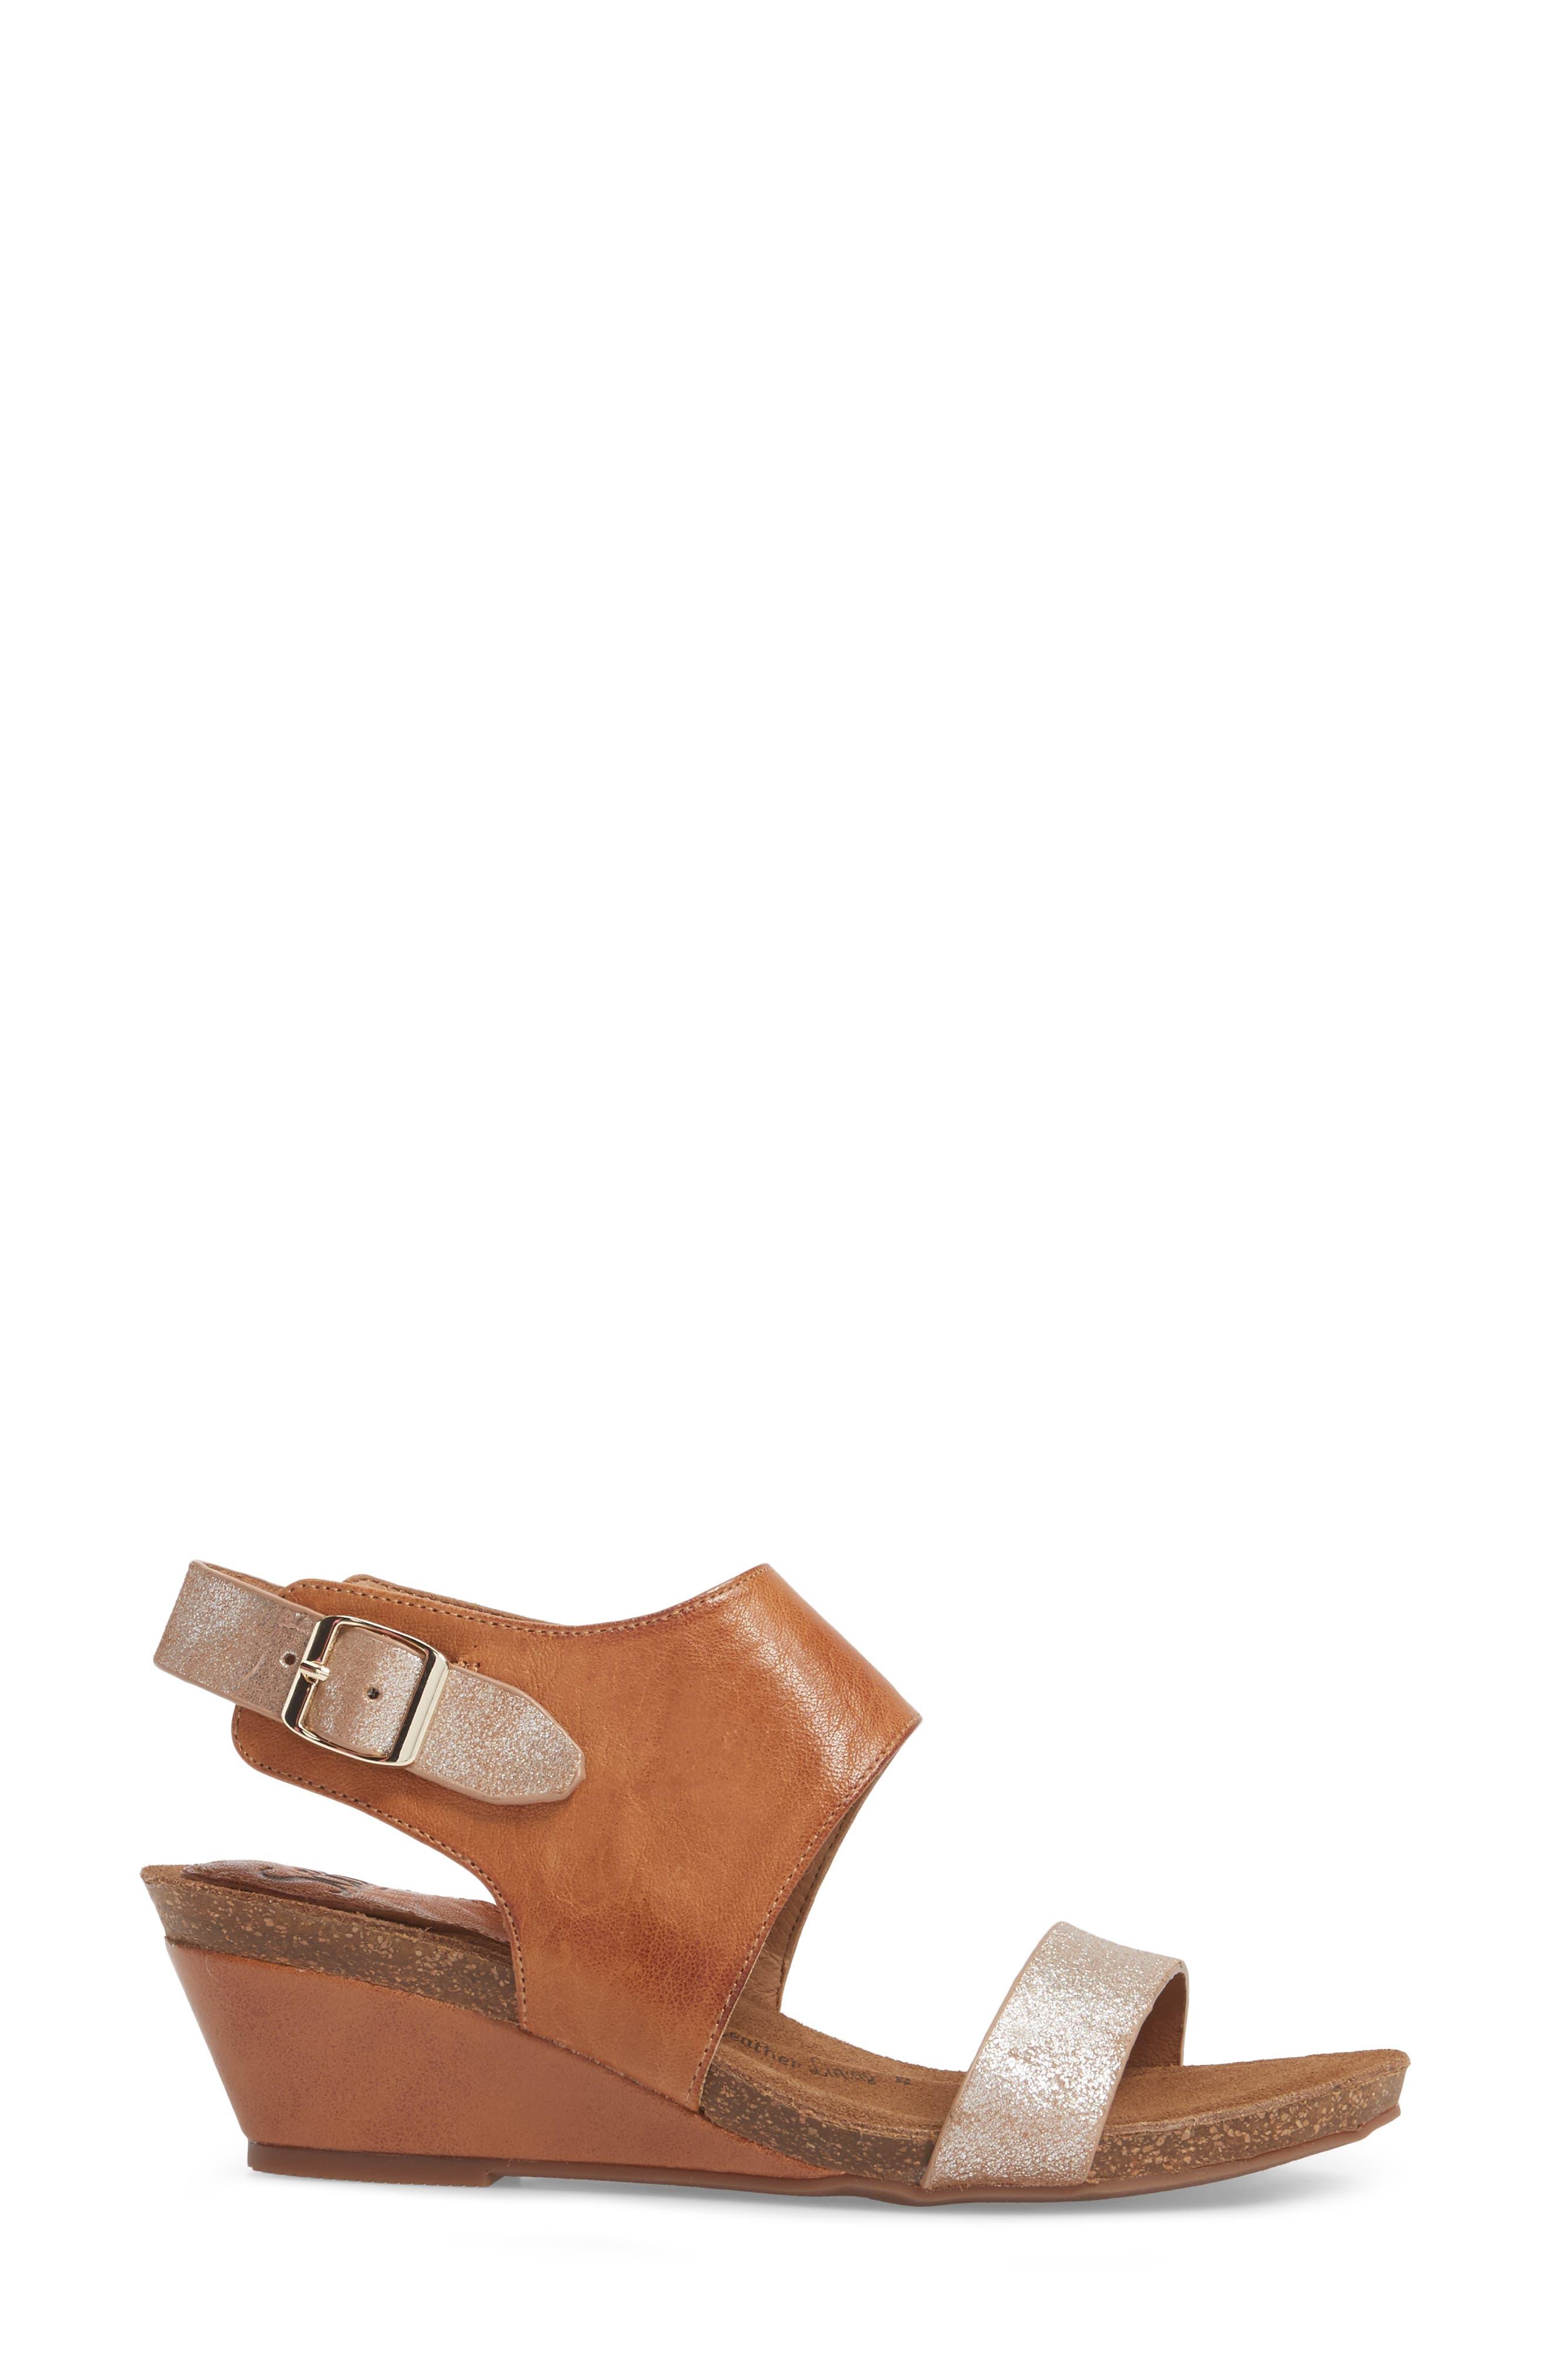 ,                             'Vanita' Leather Sandal,                             Alternate thumbnail 3, color,                             LUGGAGE/ SILVER LEATHER